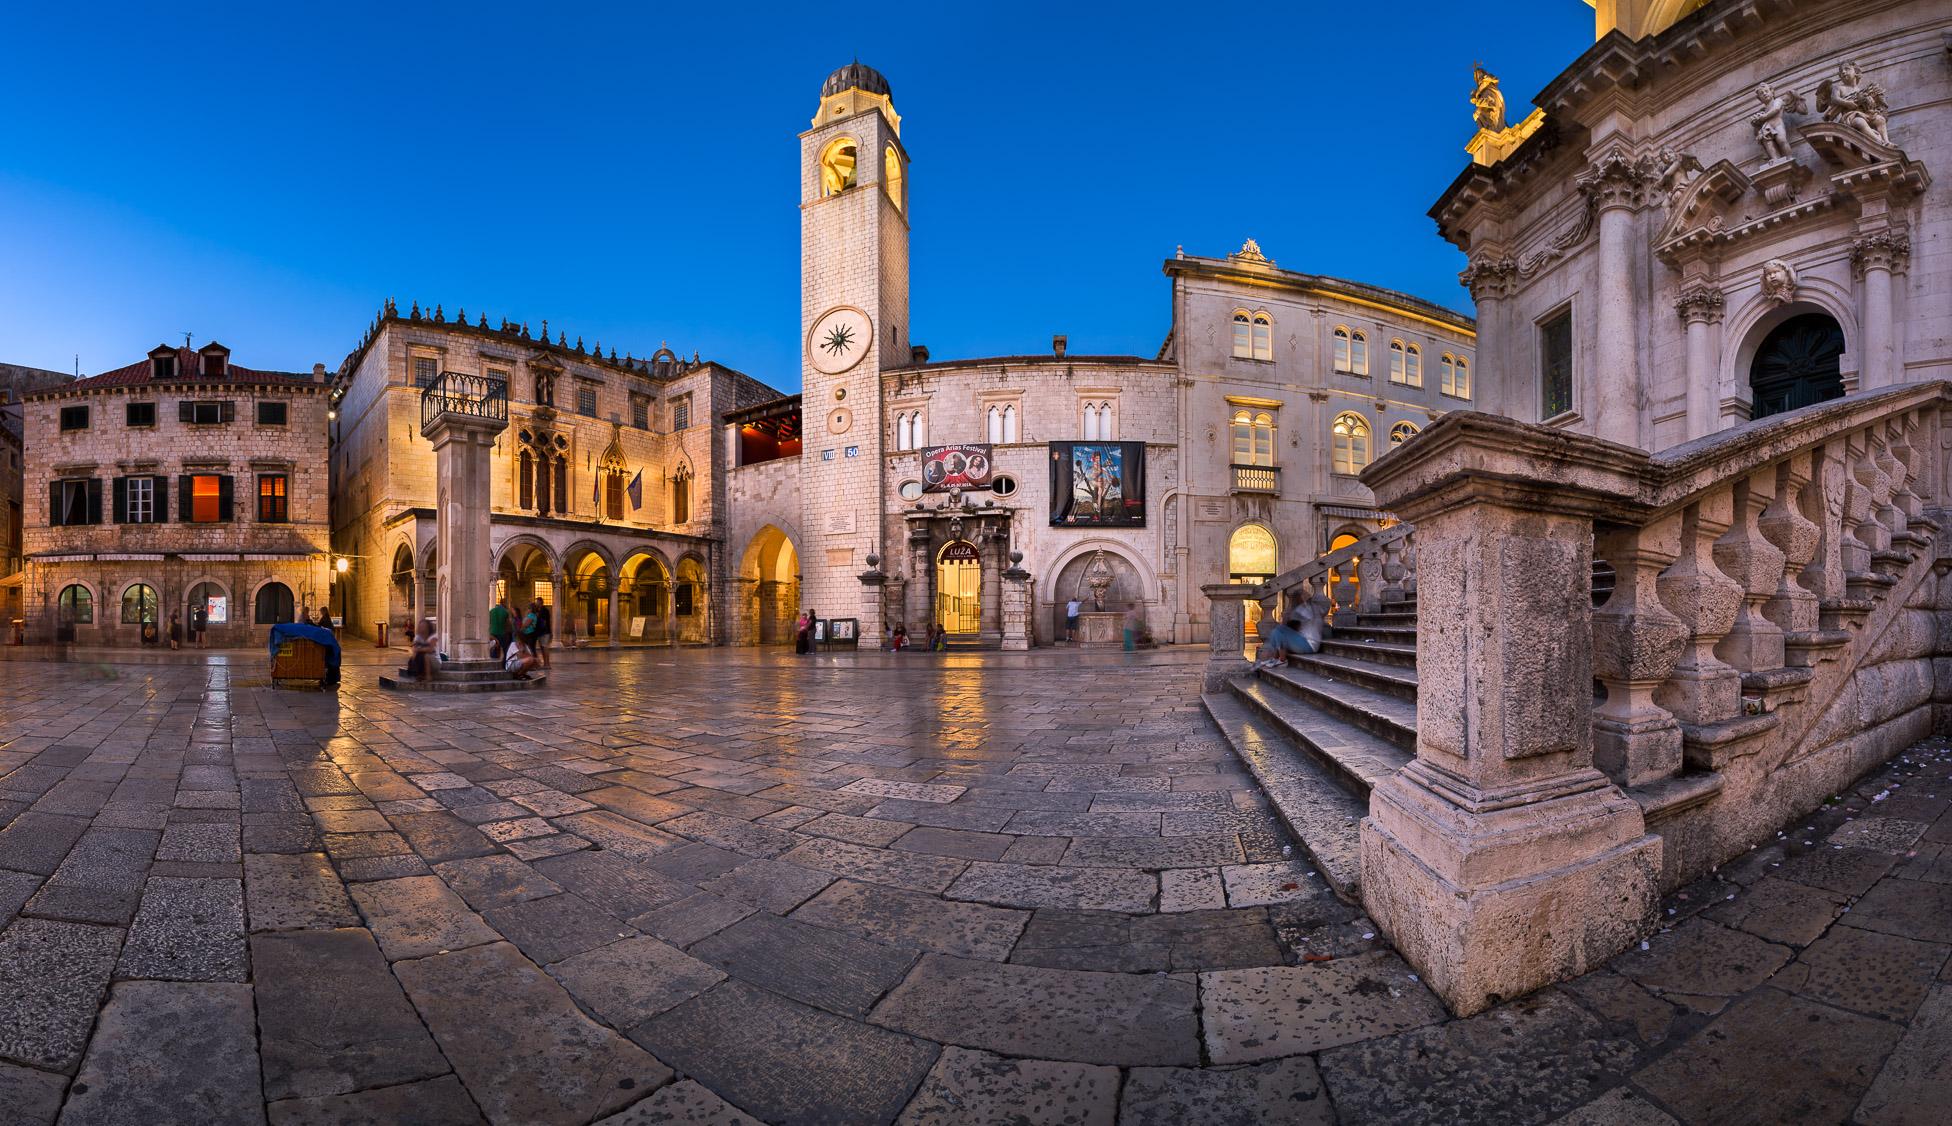 Panorama of Luza Square, Sponza Palace and Orlando Column in Dubrovnik, Dalmatia, Croatia